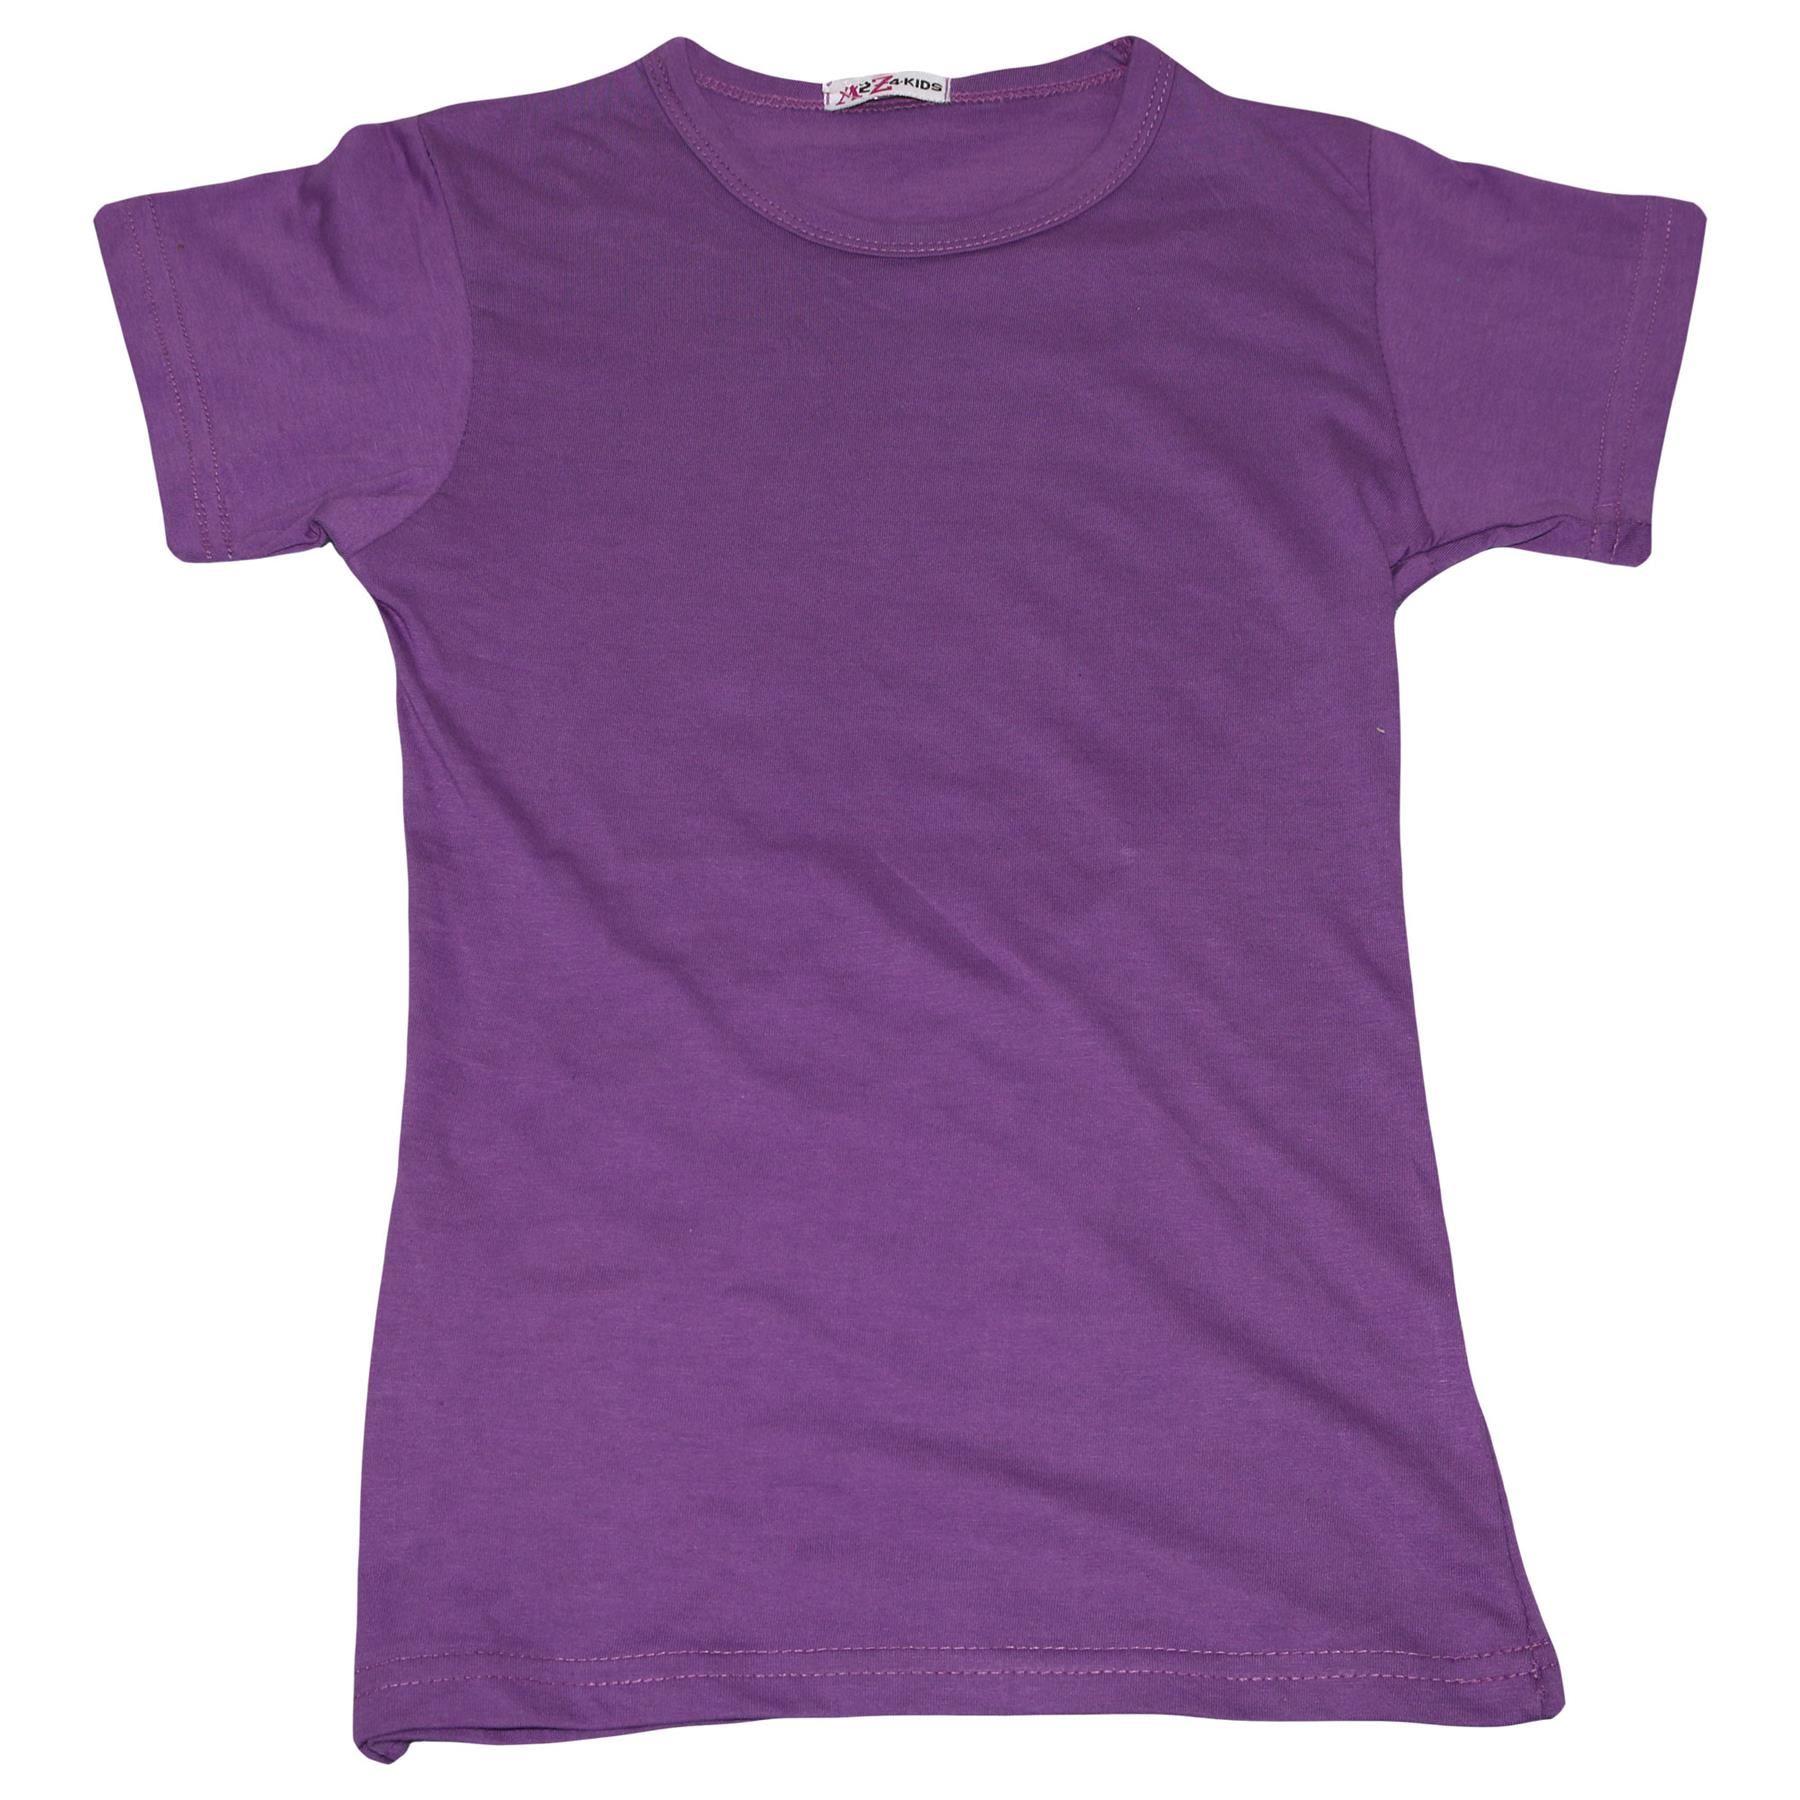 Kids-Girls-T-Shirts-Designer-100-Cotton-Plain-School-T-Shirt-Top-New-Age-3-13Yr thumbnail 20